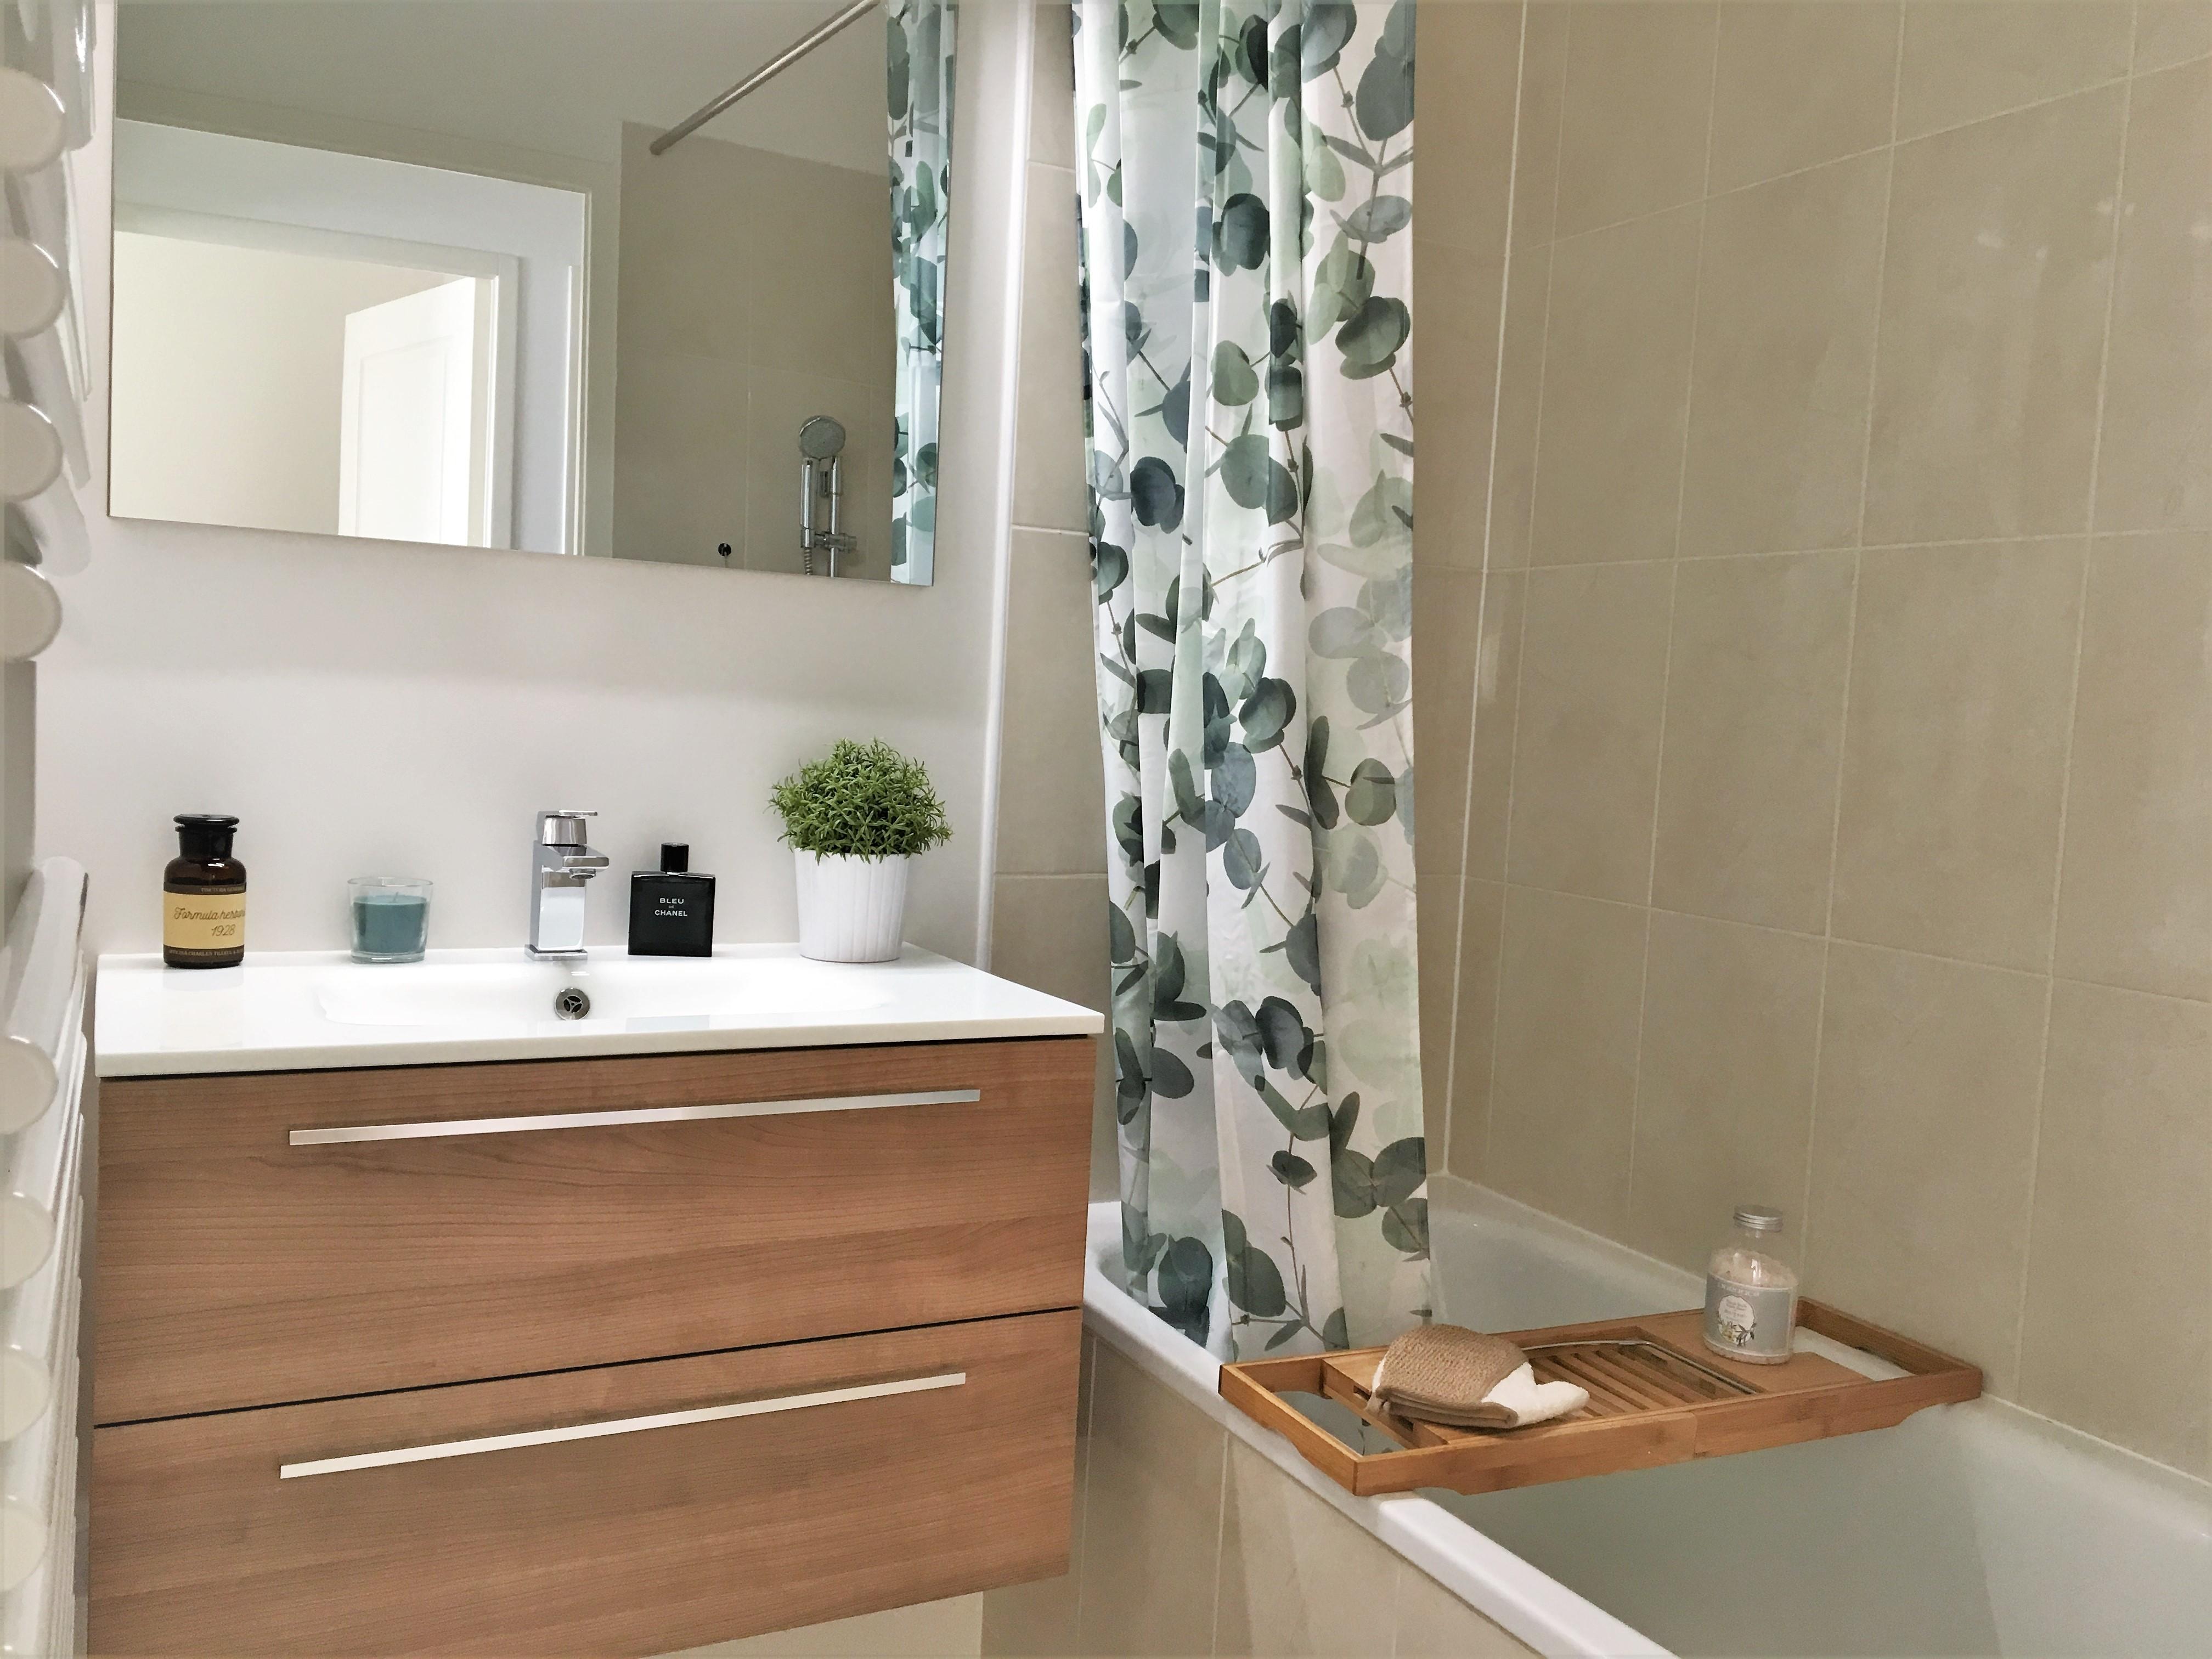 ma nouvelle salle de bain mademoiselle pucine. Black Bedroom Furniture Sets. Home Design Ideas